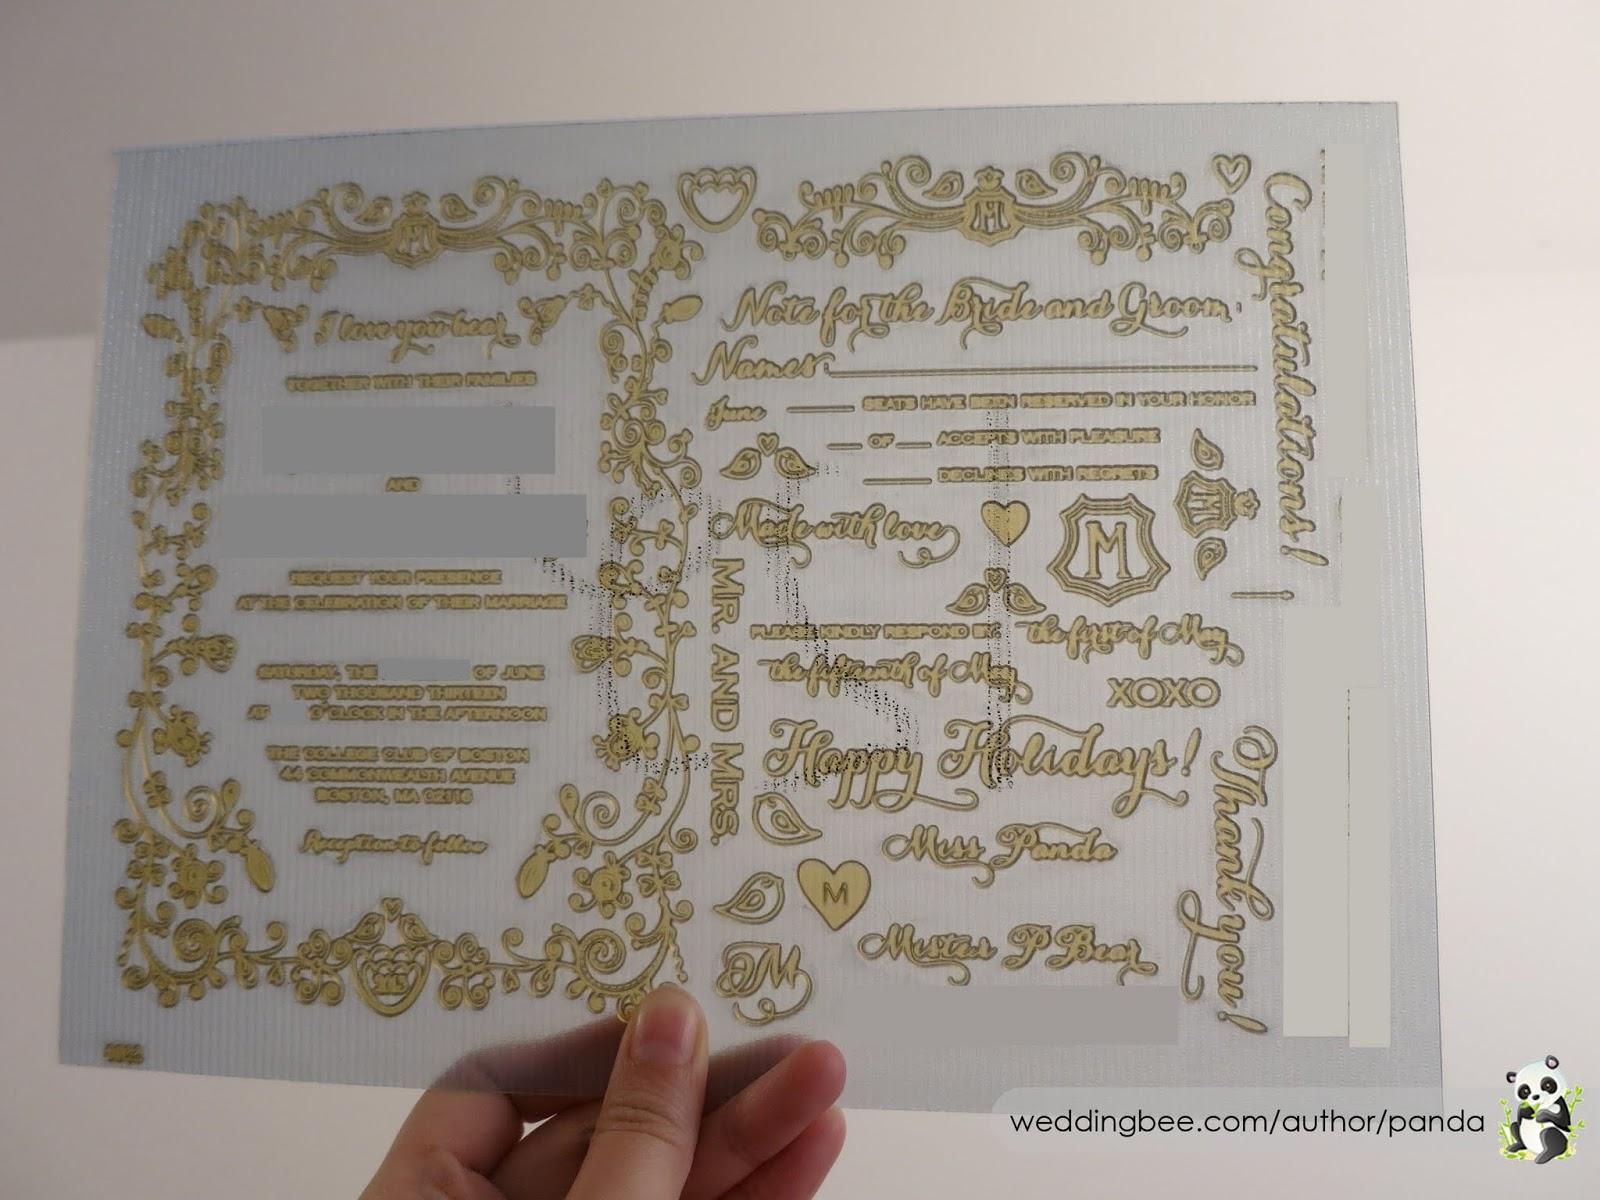 Diy letterpress invitations part 1 tips for making your letterpress